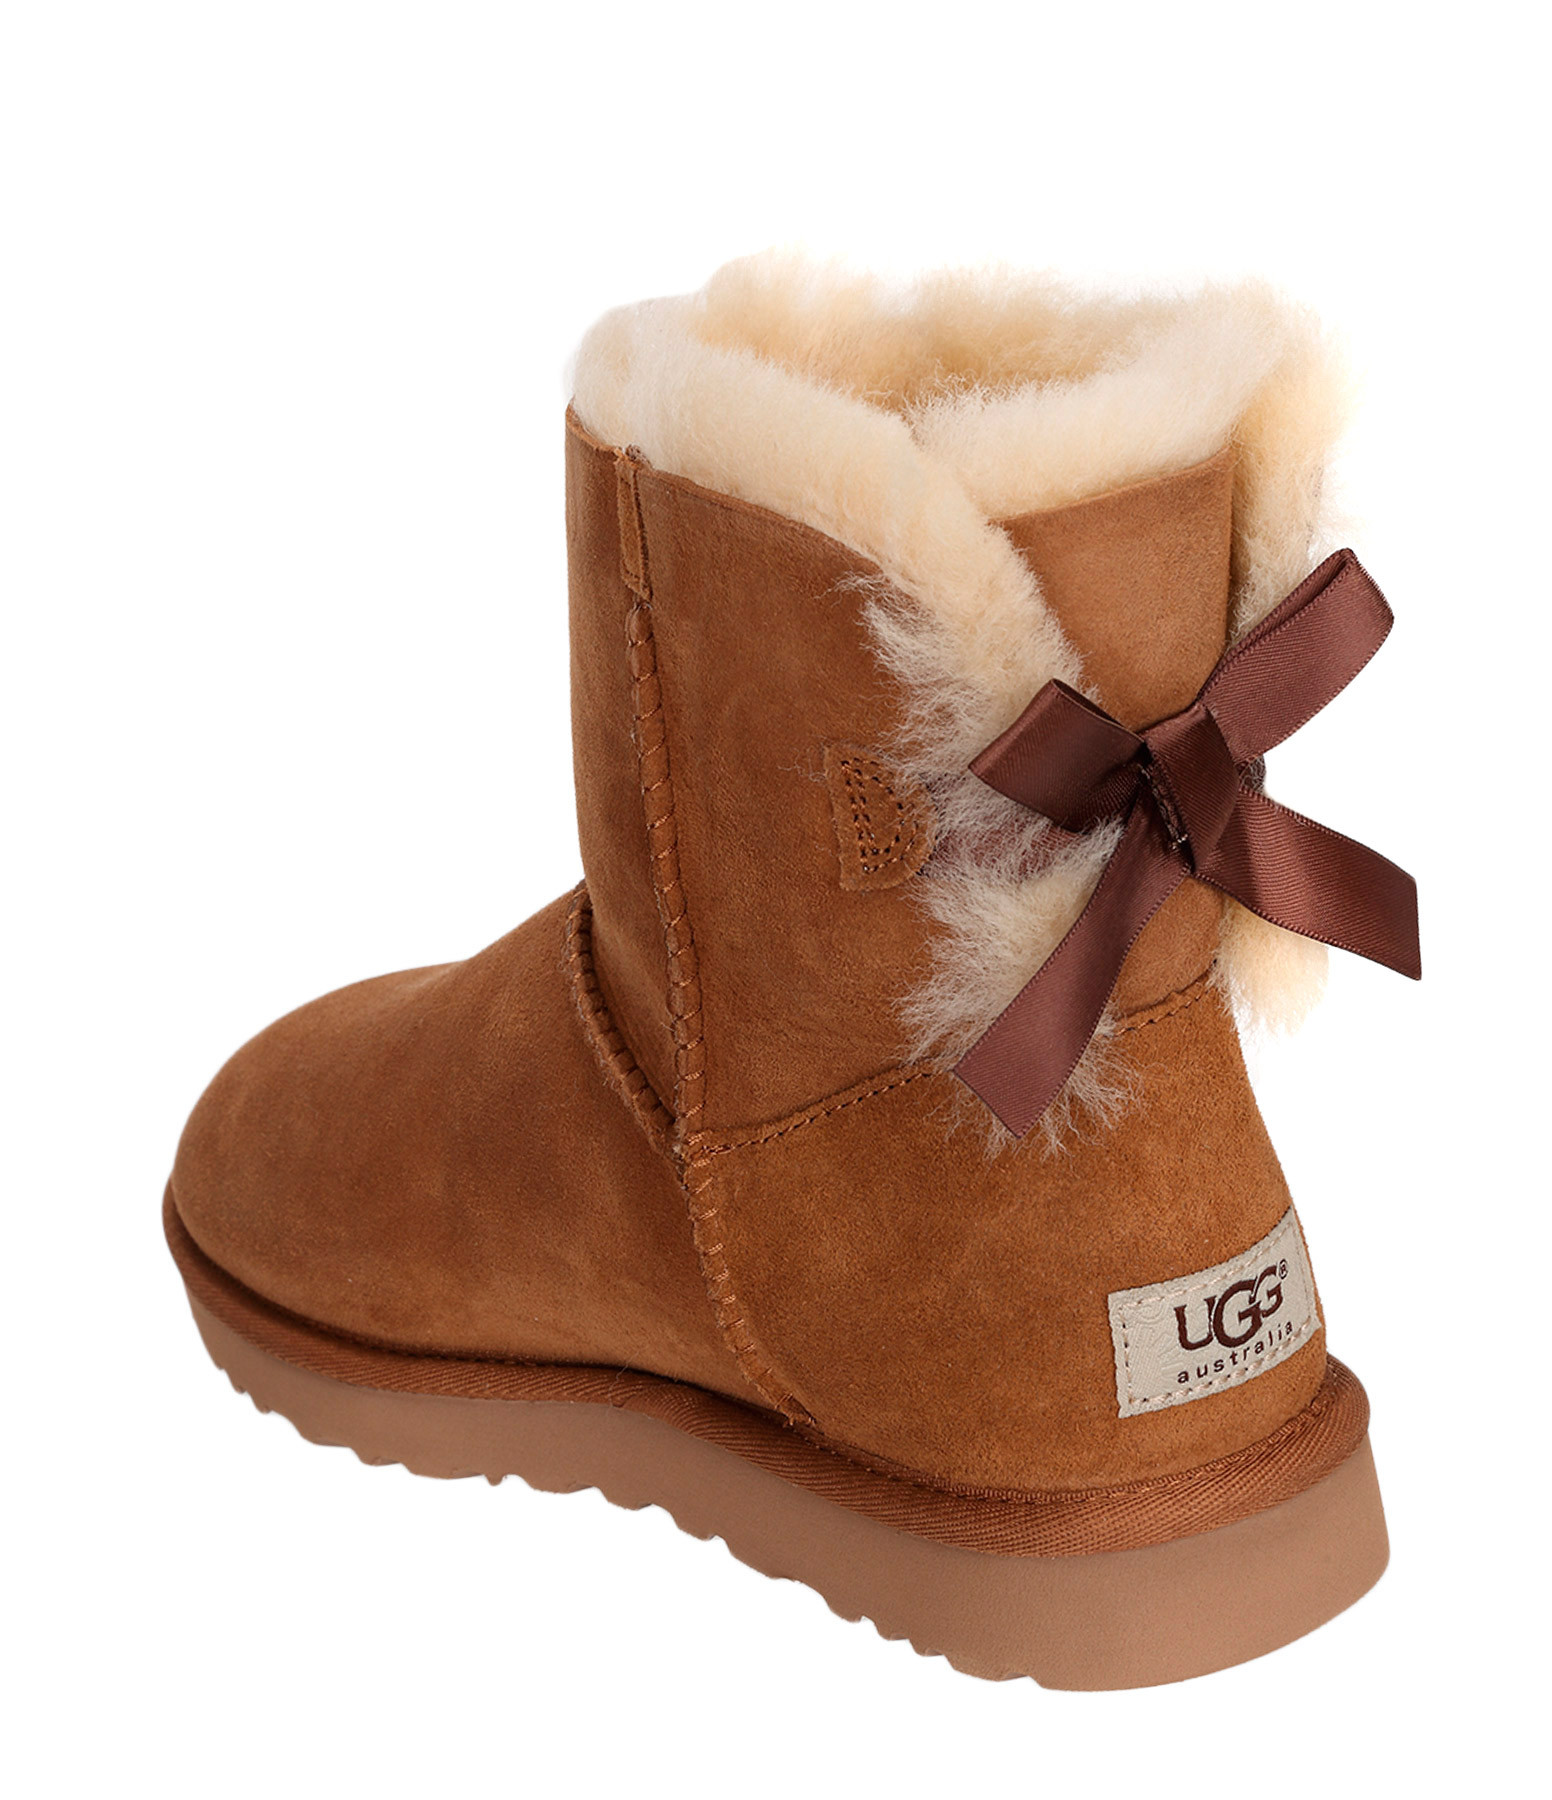 Boots Mini Bailey Bow Chestnut - UGG